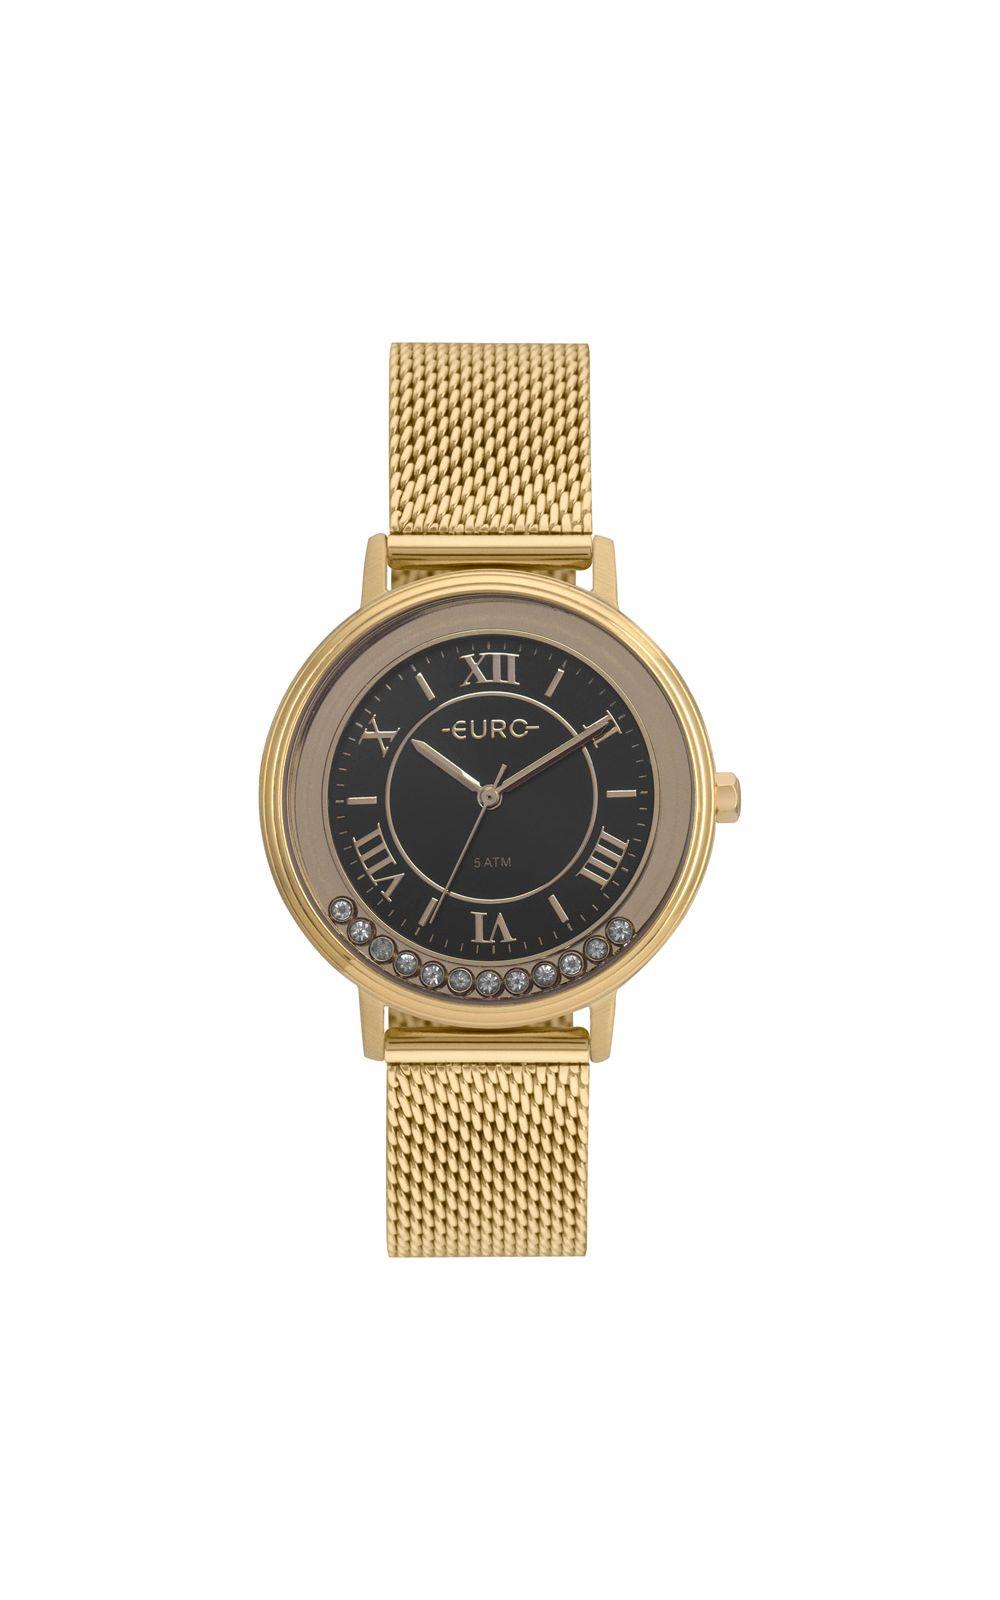 Foto 1 - Relógio Euro Crystal Move Feminino Dourado EU2035YRU/4P